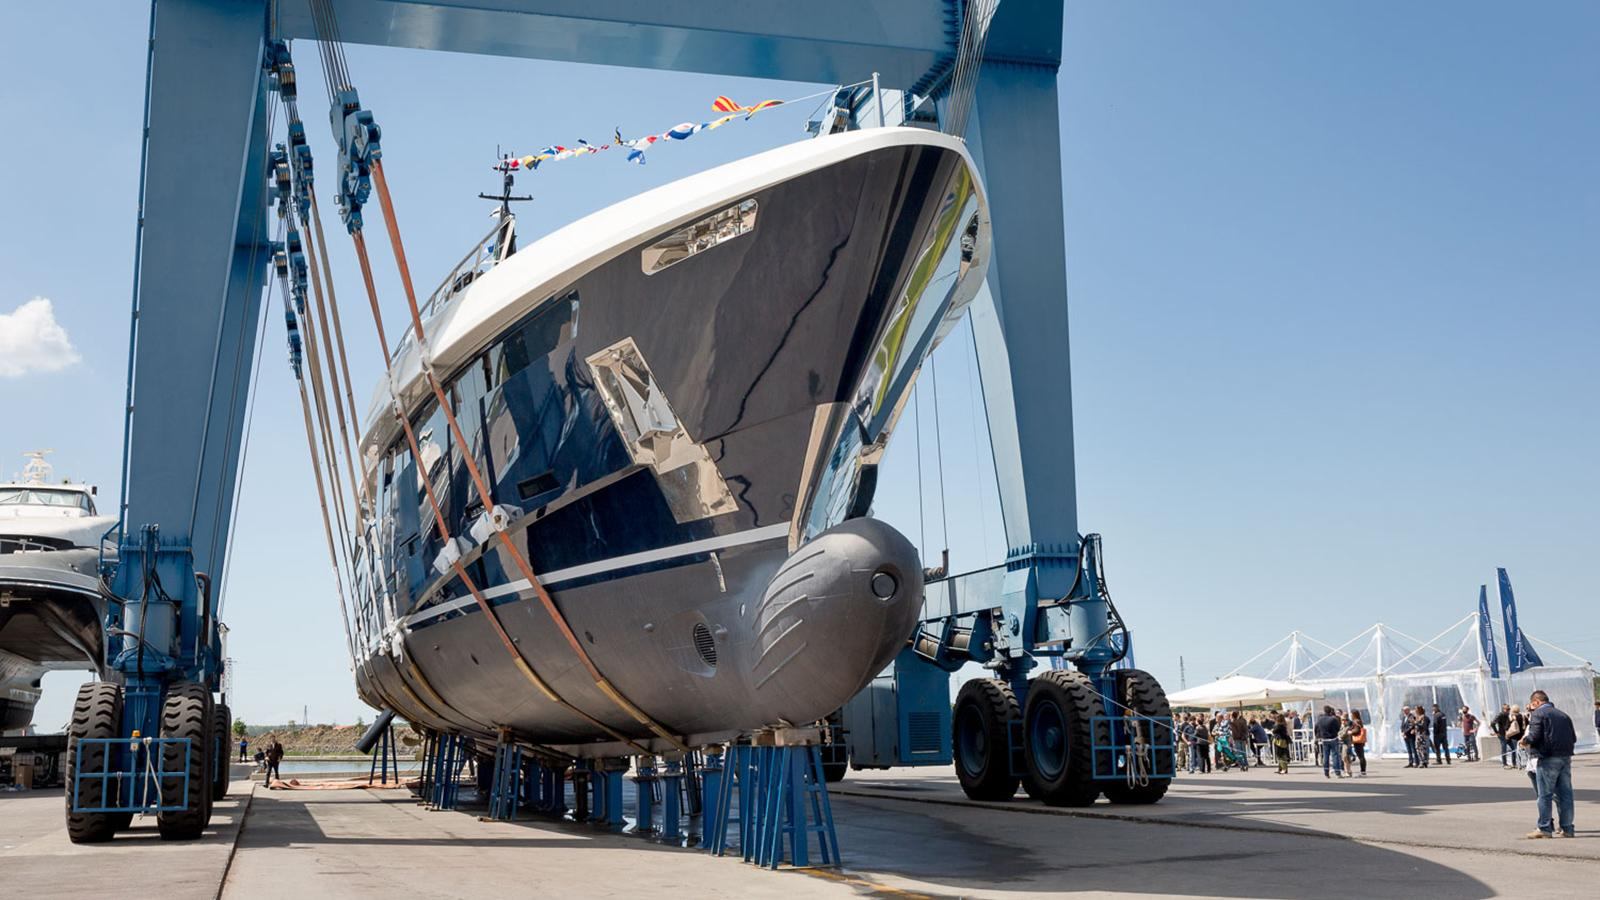 n2h motoryacht rossinavi prince shark 49m 2017 launch bow